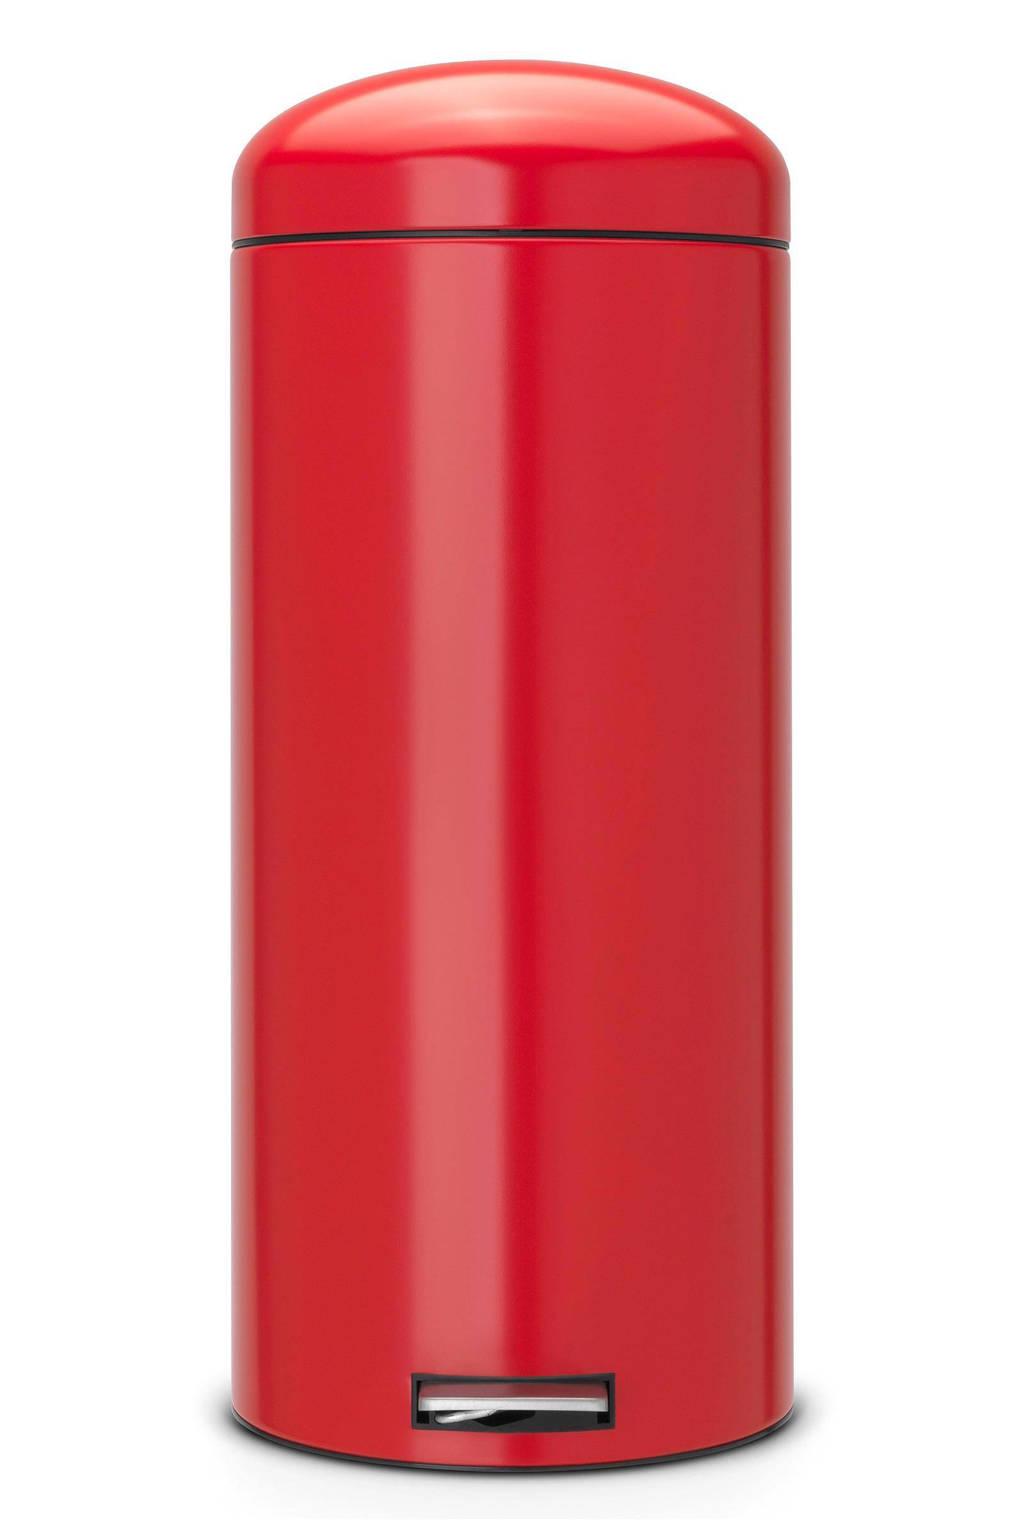 Brabantia Pedaalemmer Retro Bin.Brabantia Retro Bin 30 Liter Pedaalemmer Wehkamp